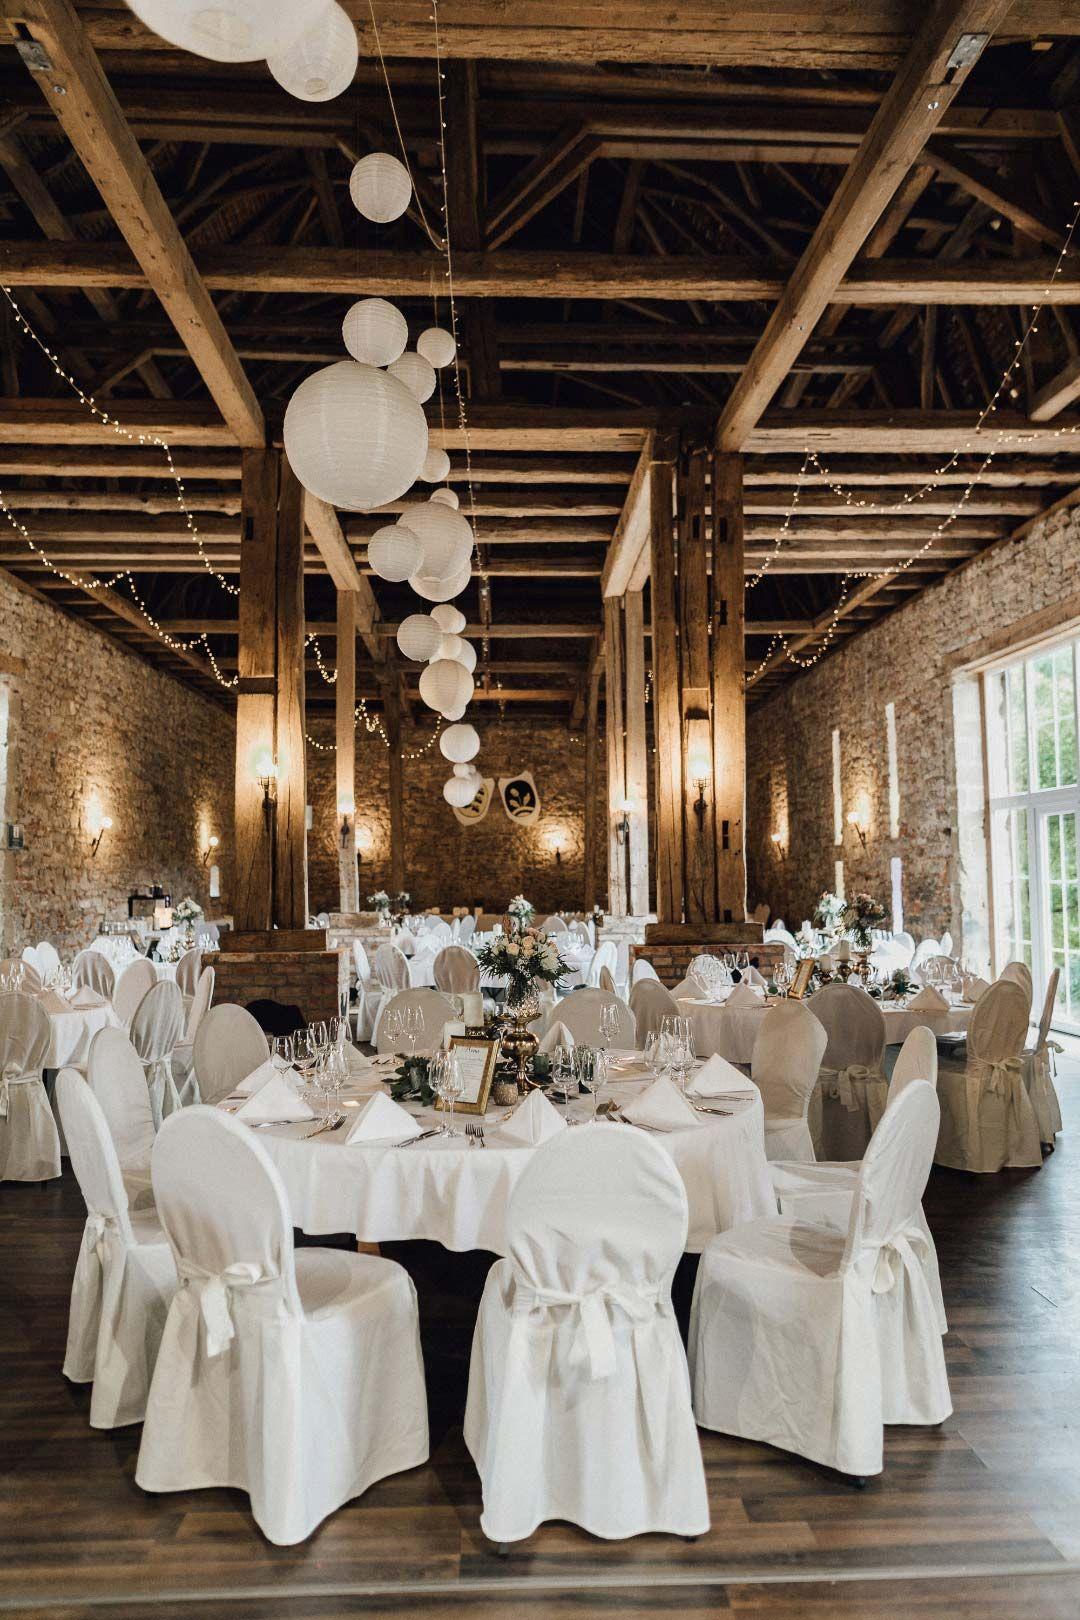 Hermoso lugar para la fiesta de bodas con mesas redondas en un …